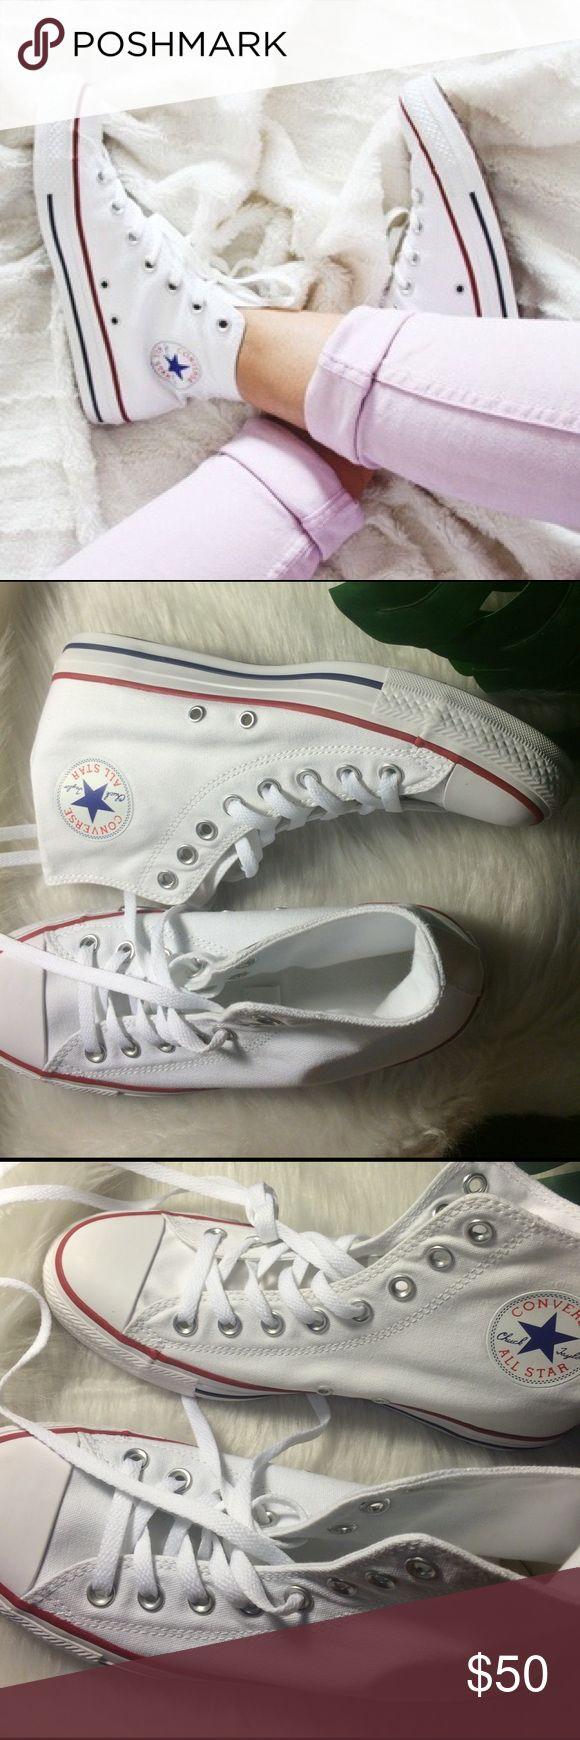 📍1 HOUR SALE📍CONVERSE CHUCK TAYLORS WHITE SHOES No box. Converse Shoes Sneakers